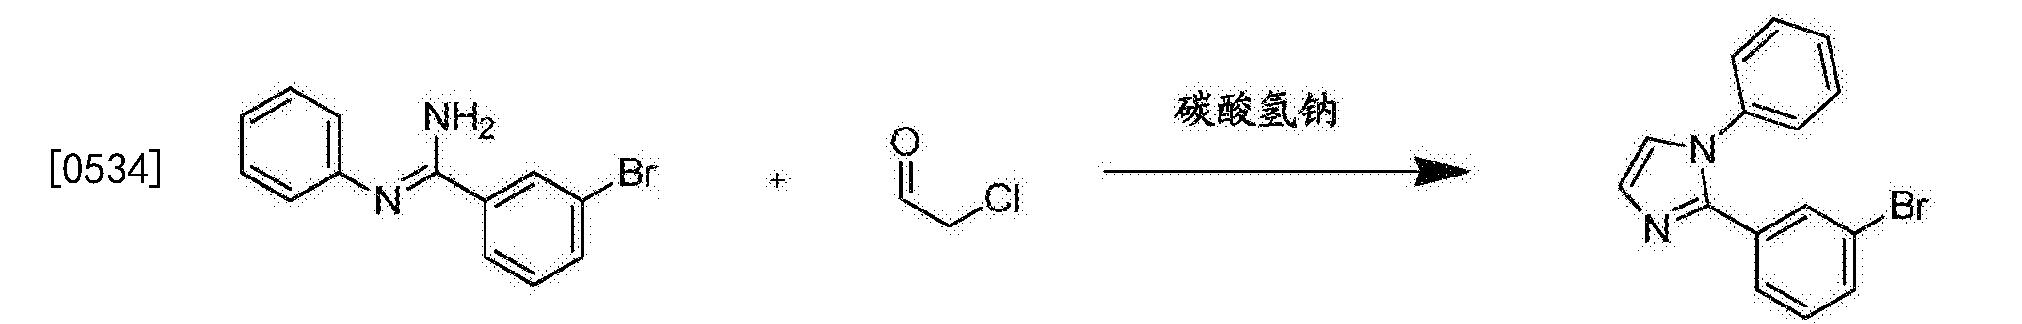 Figure CN106749425AD01571